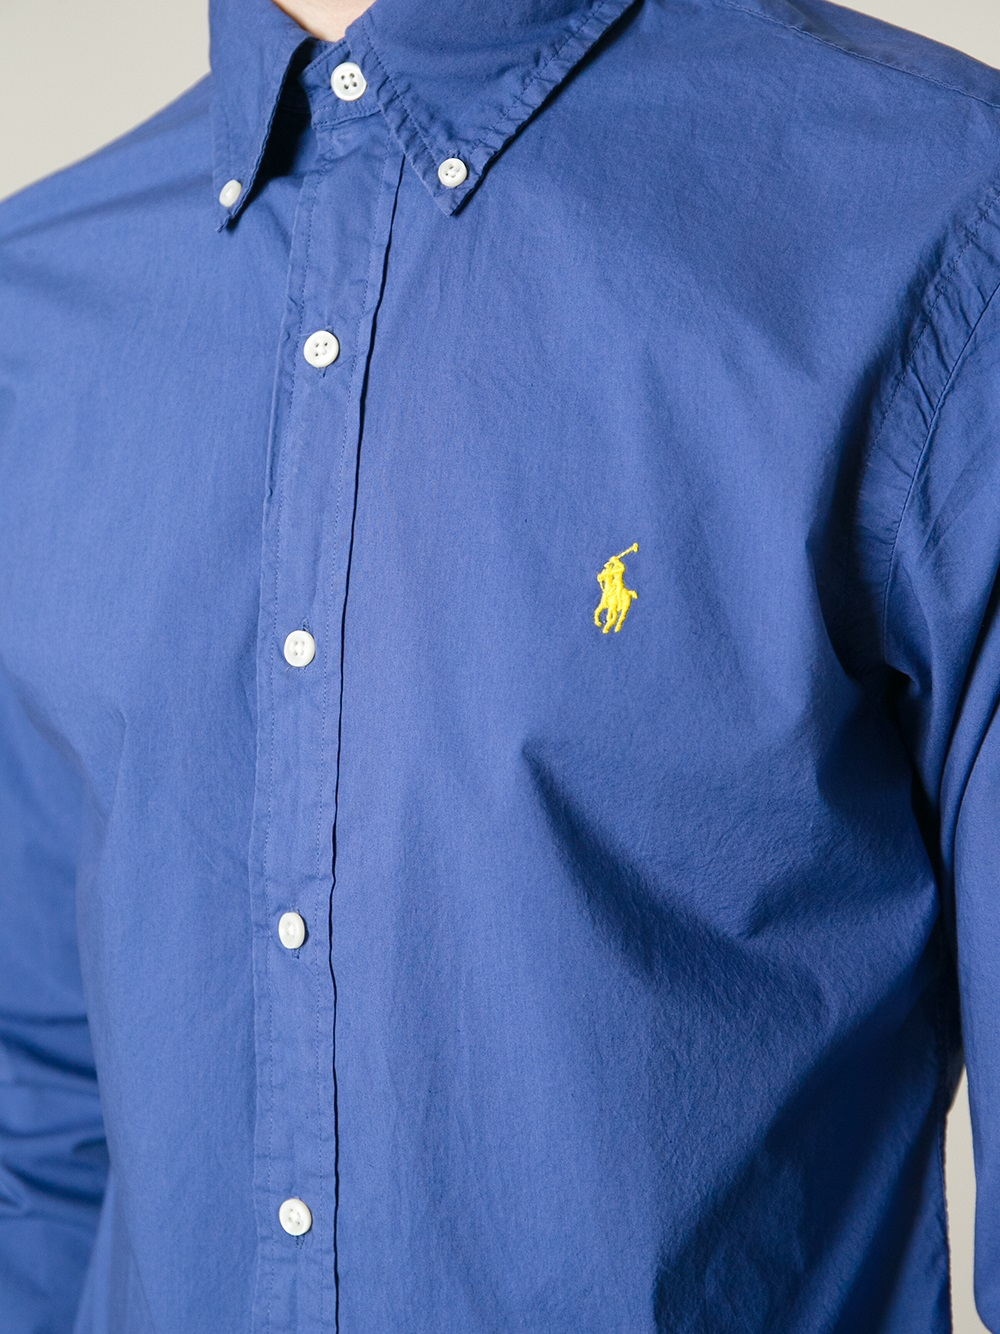 Lyst polo ralph lauren classic casual shirt in blue for men for Polo ralph lauren casual button down shirts